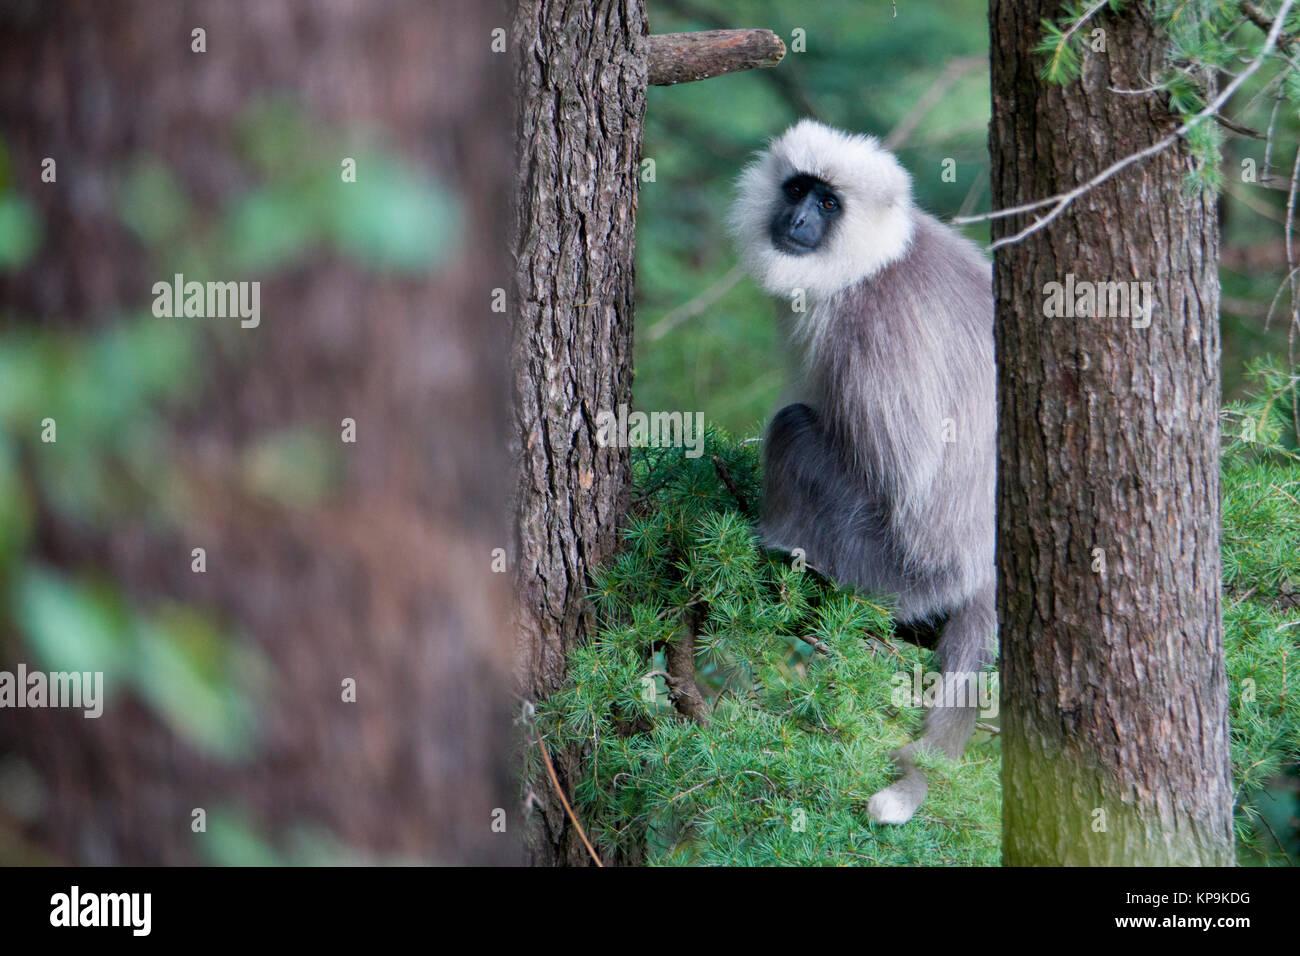 Kashmir gray langur (Semnopithecus ajax) monkey in cedar forest - Stock Image